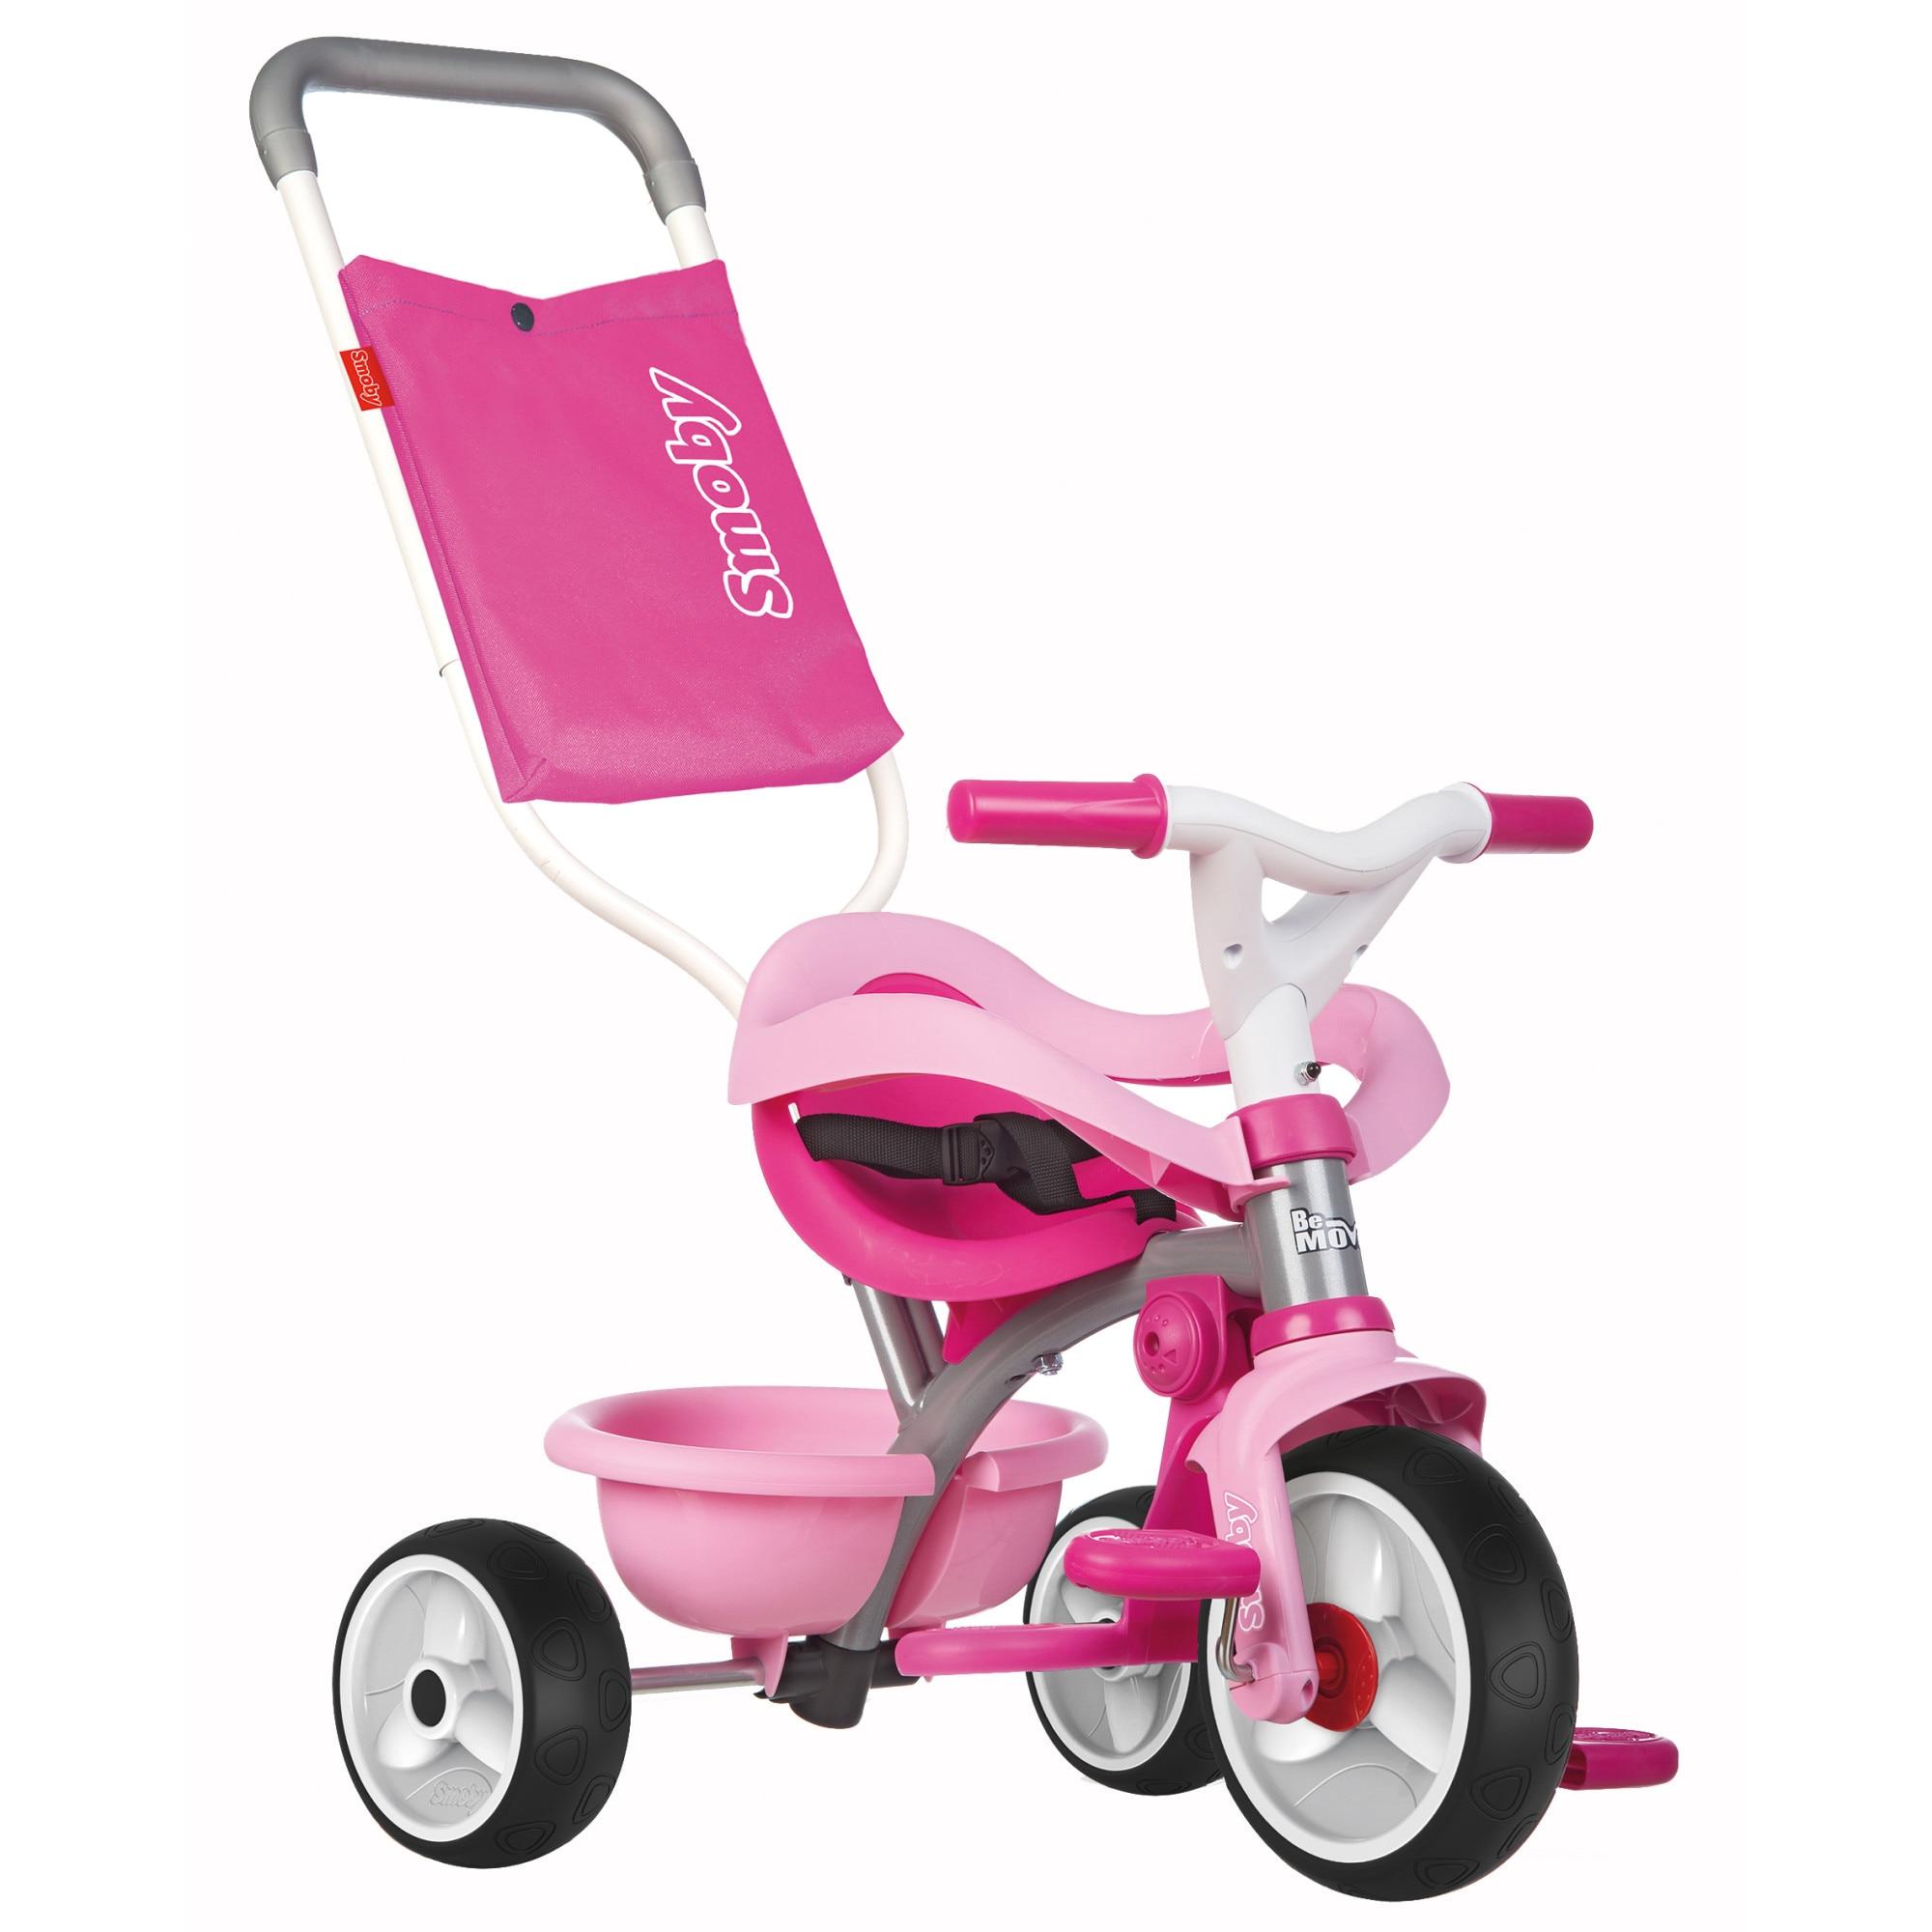 Fotografie Tricicleta Smoby Be Move Comfort, cu roti silentioase, roz